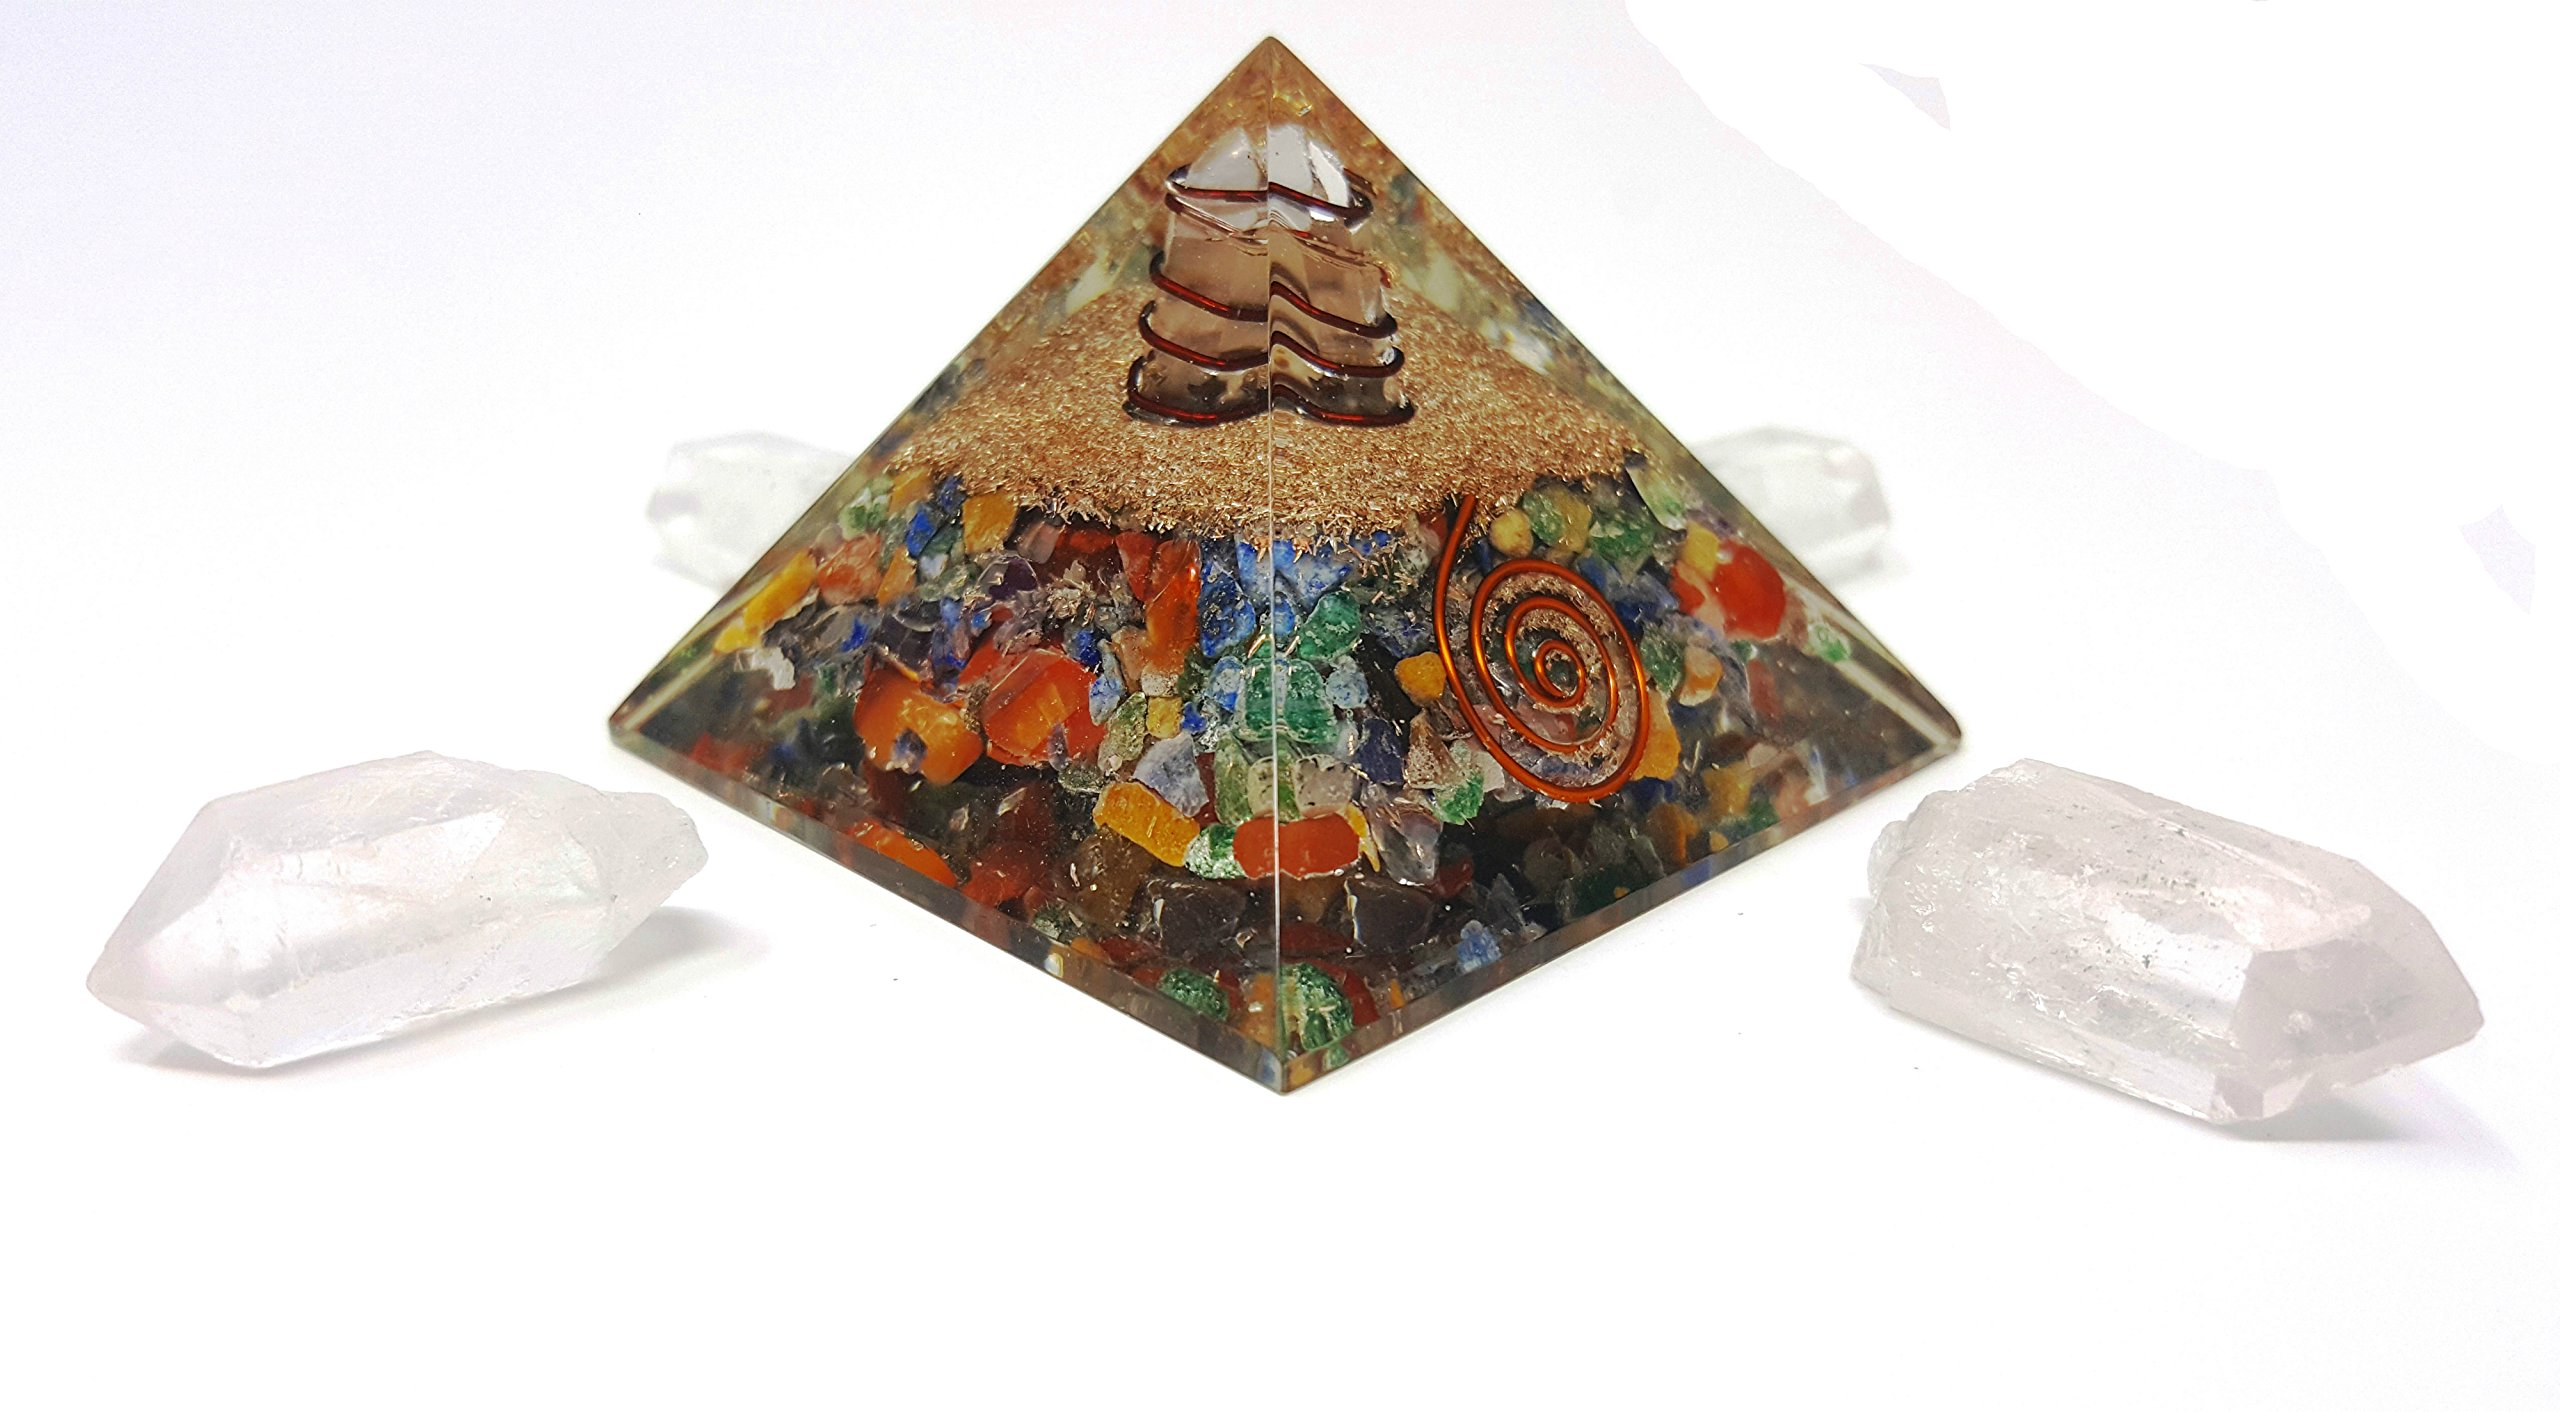 7 Chakra Crystal Orgone Pyramid Kit/Includes 4 Crystal Quartz Energy Points/EMF Protection Meditation Yoga Energy Generator by Auramore (Image #4)